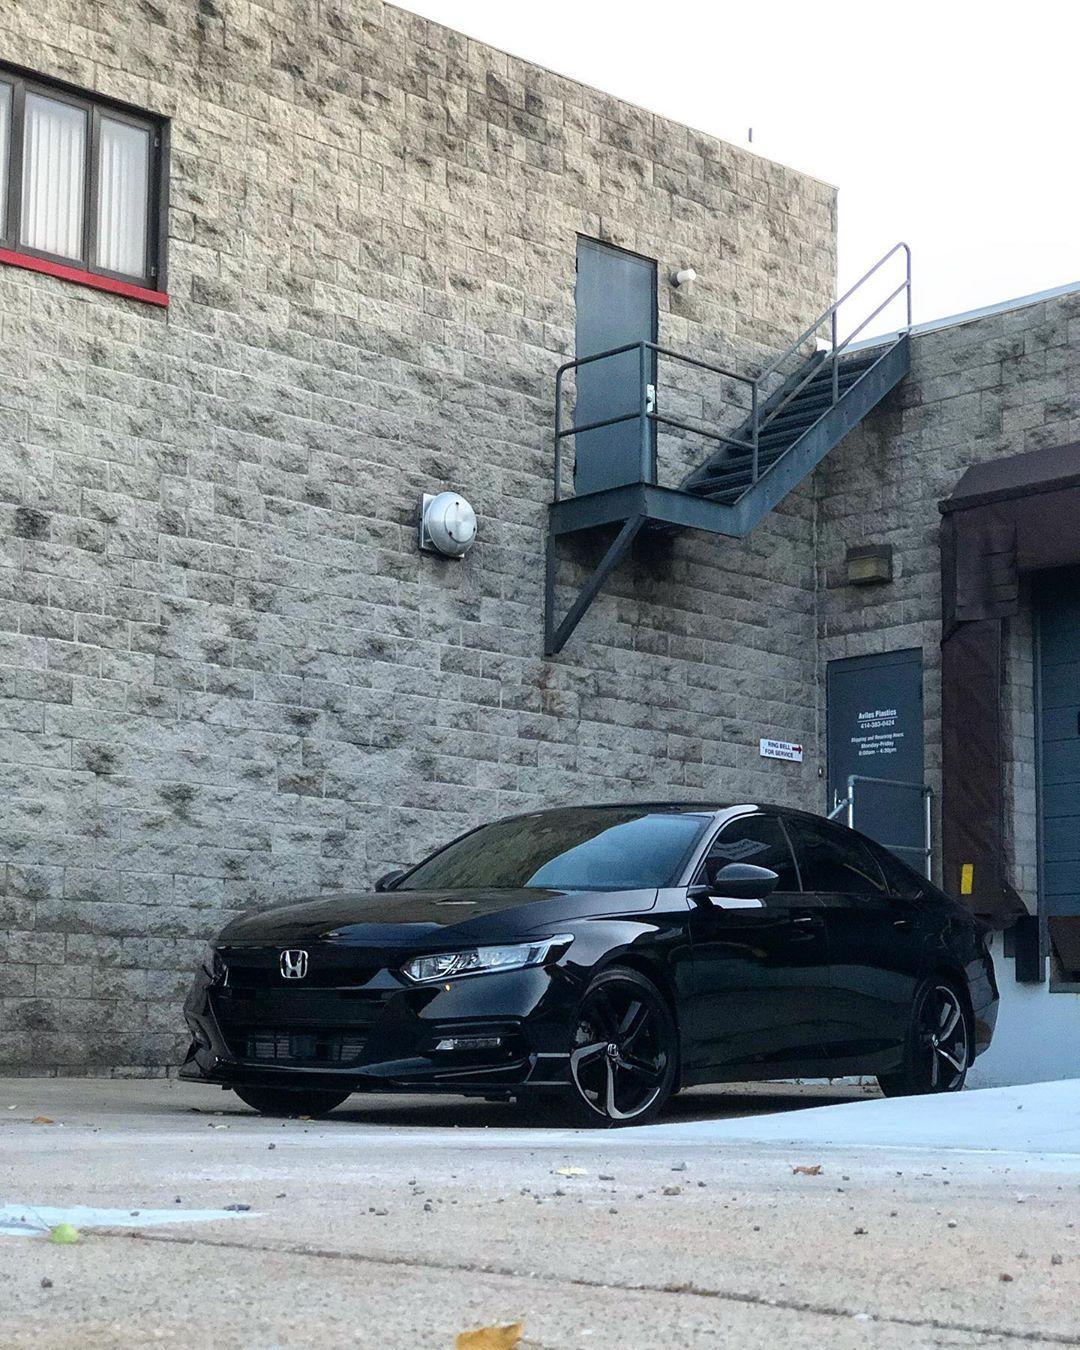 JET ️ BLACK ️SEDAN hondaaccord2018 Honda accord sport